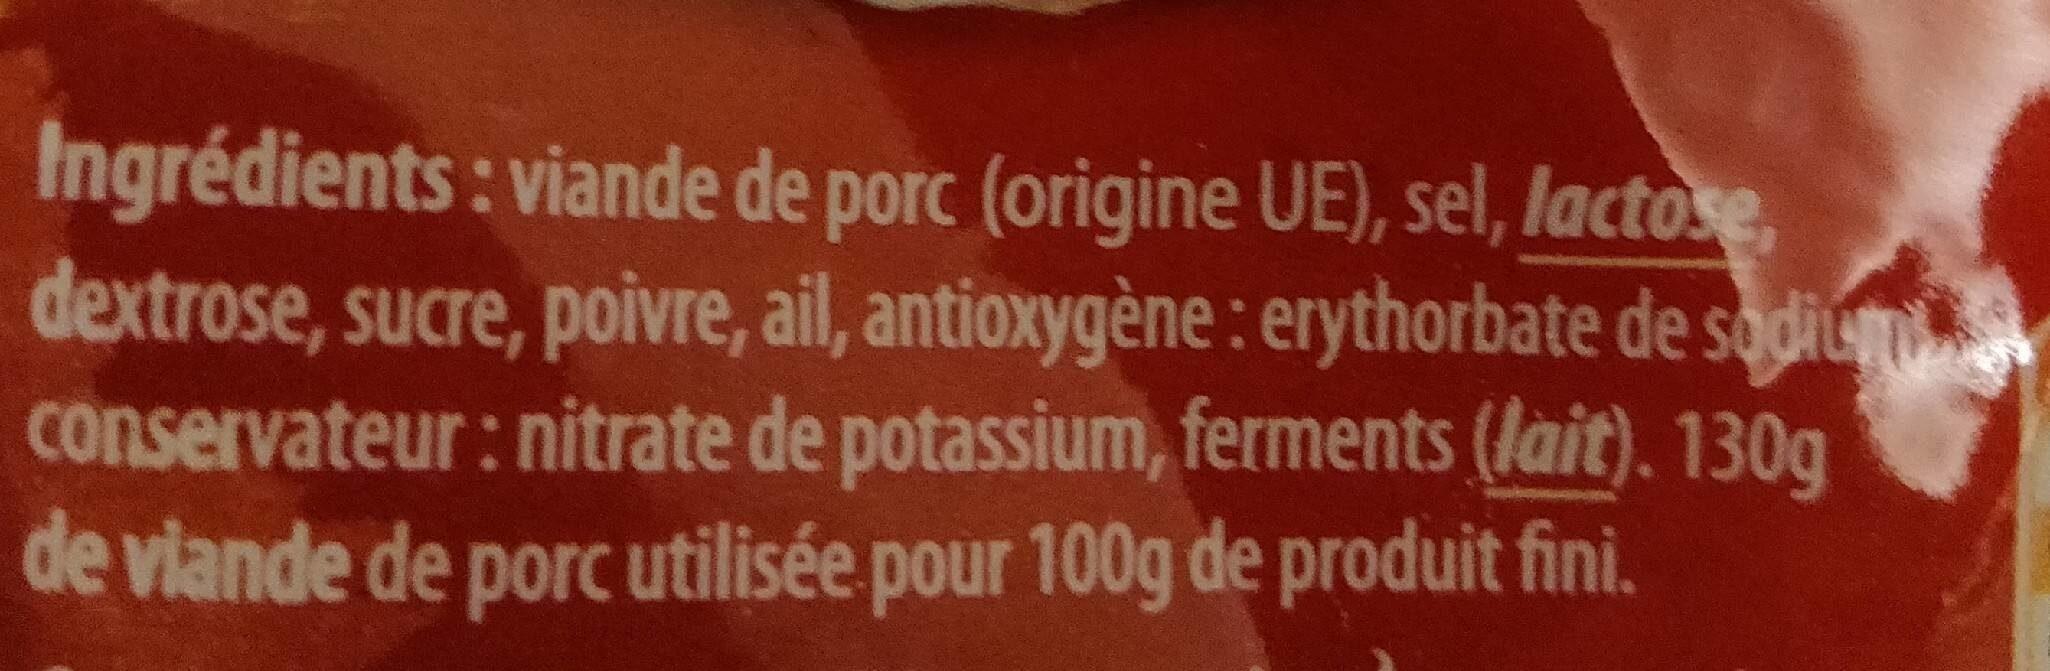 Vanilla crème caramel - Informations nutritionnelles - fr